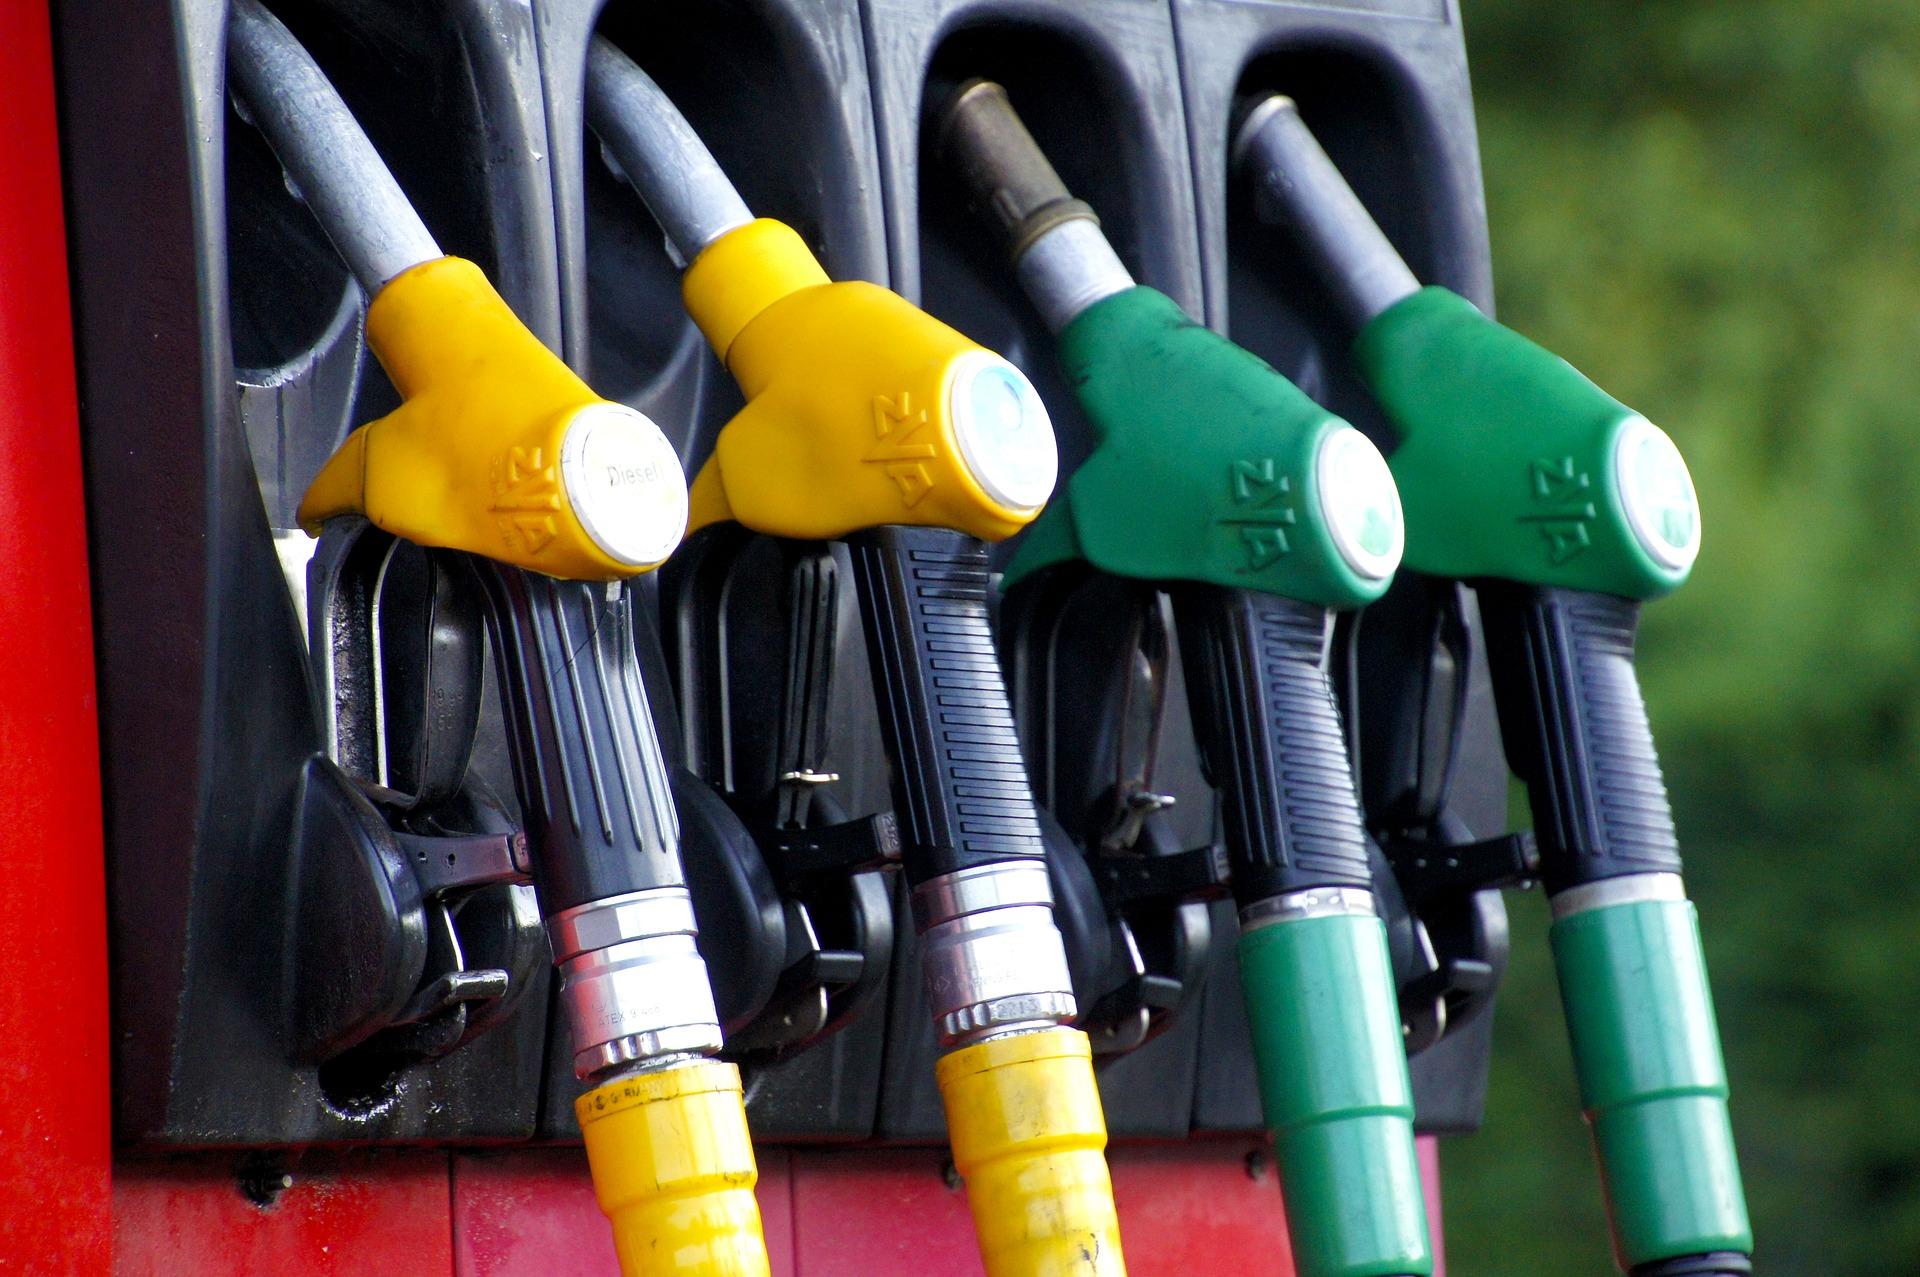 fuel-1596622_1920